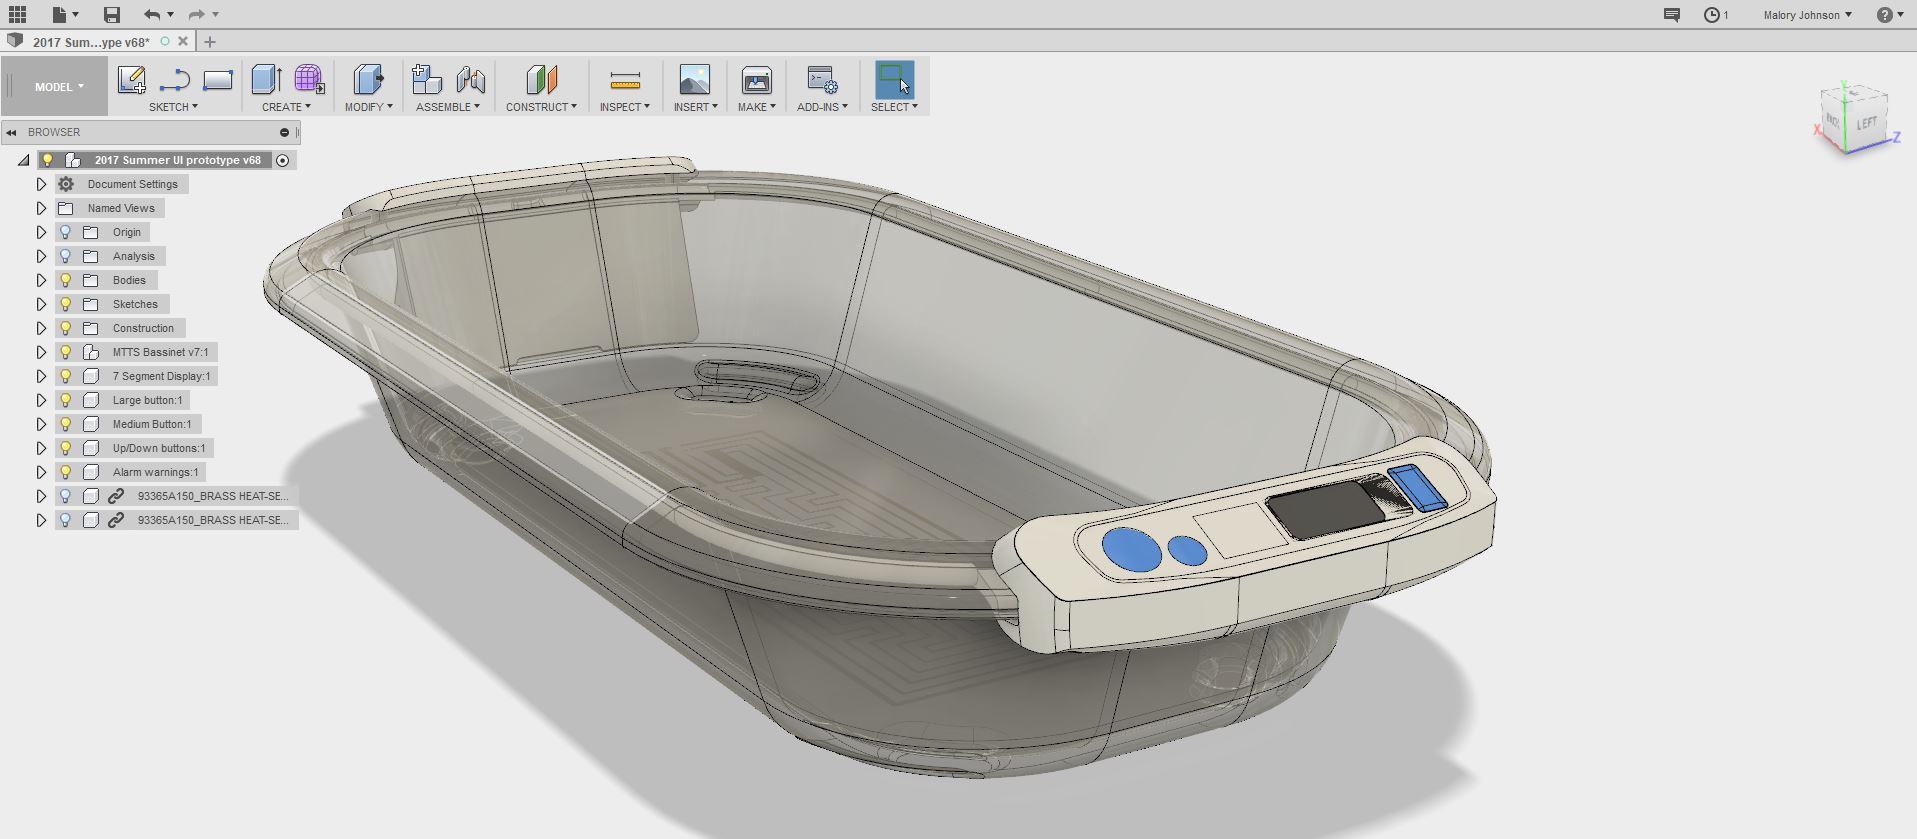 fusion 360 Otter screenshot.JPG